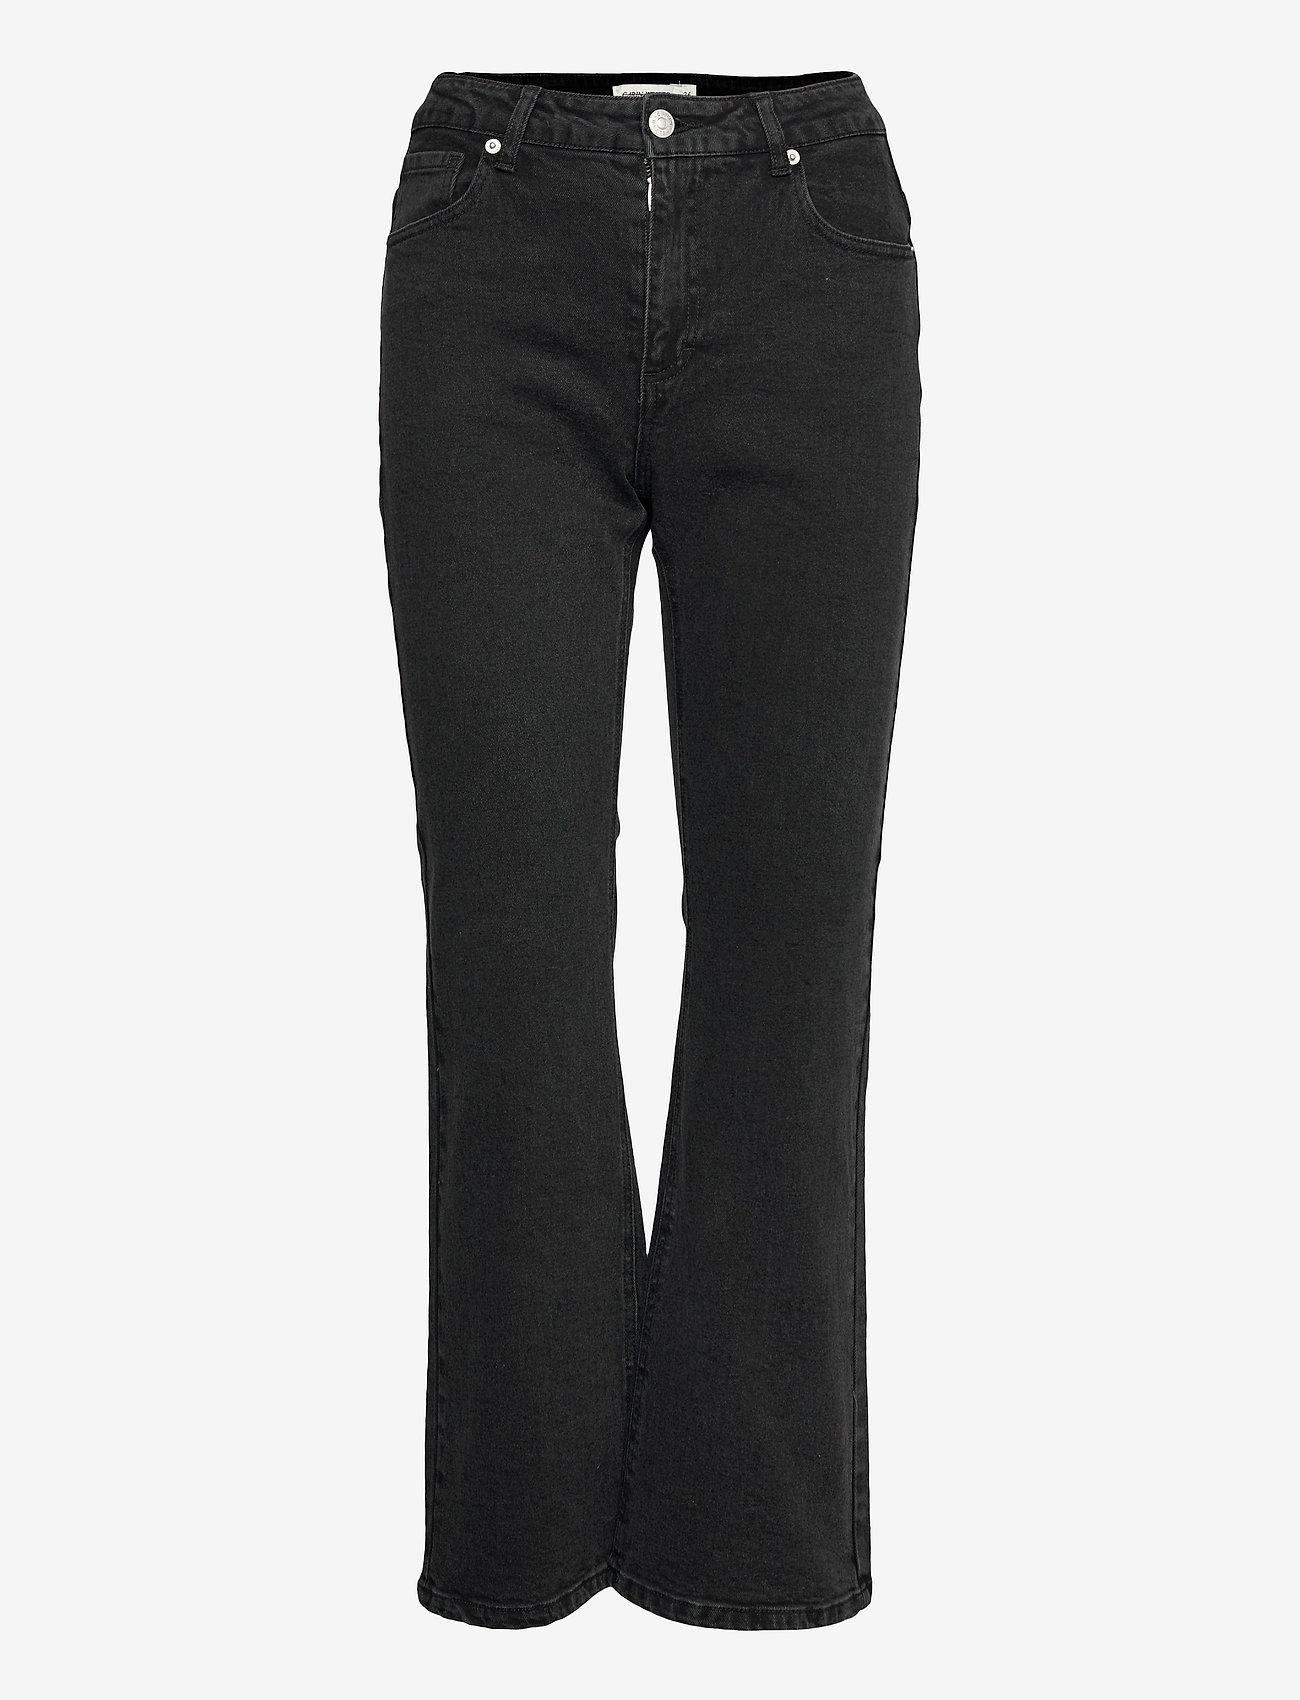 Carin Wester - Palmer - flared jeans - black/dk grey - 1